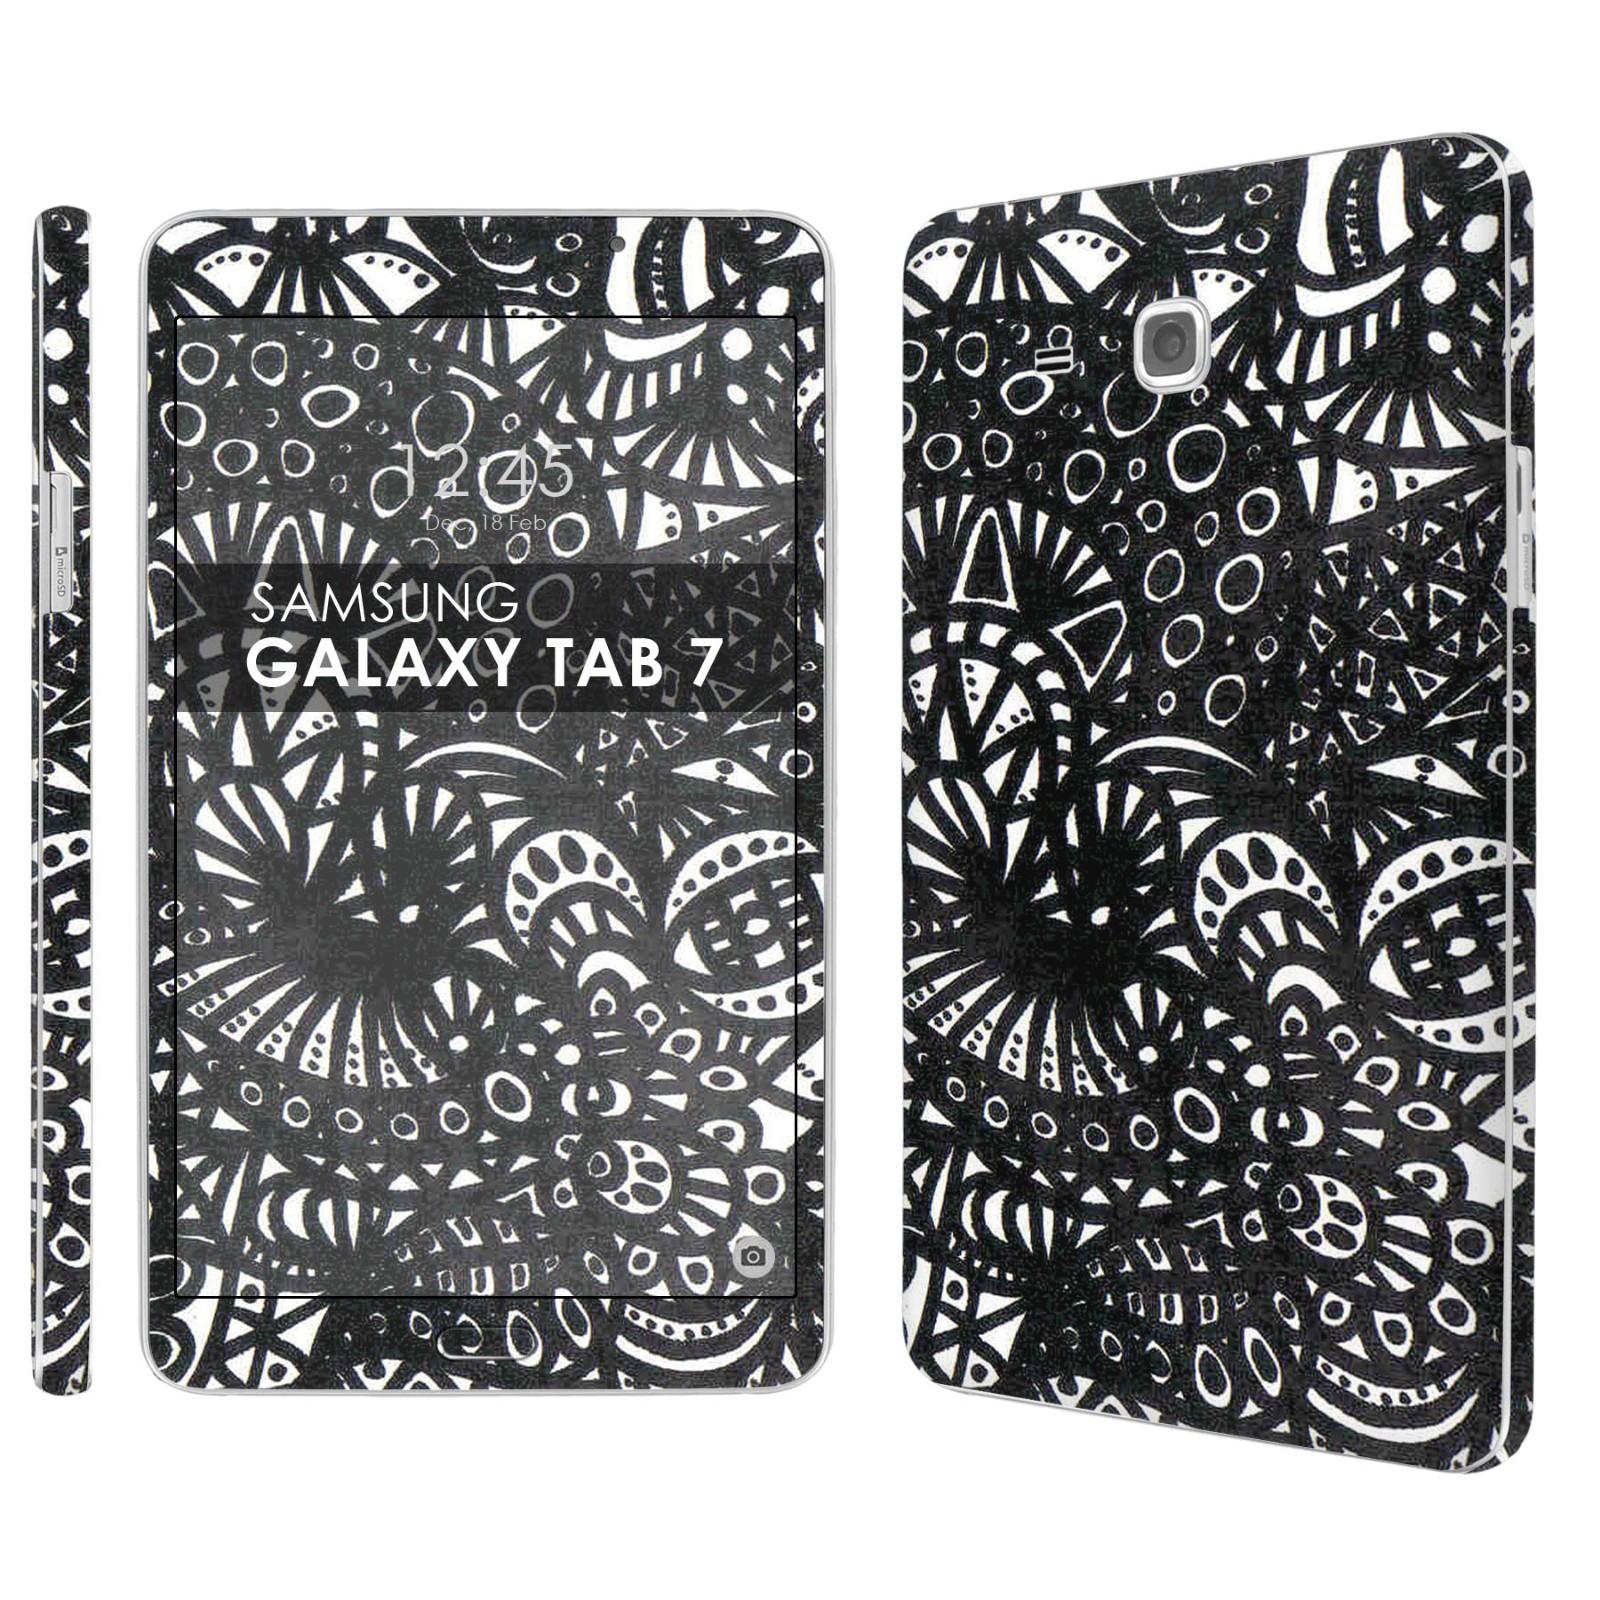 "Skin Decal For Samsung Galaxy Tab A [7 0"" Screen] [Matching"